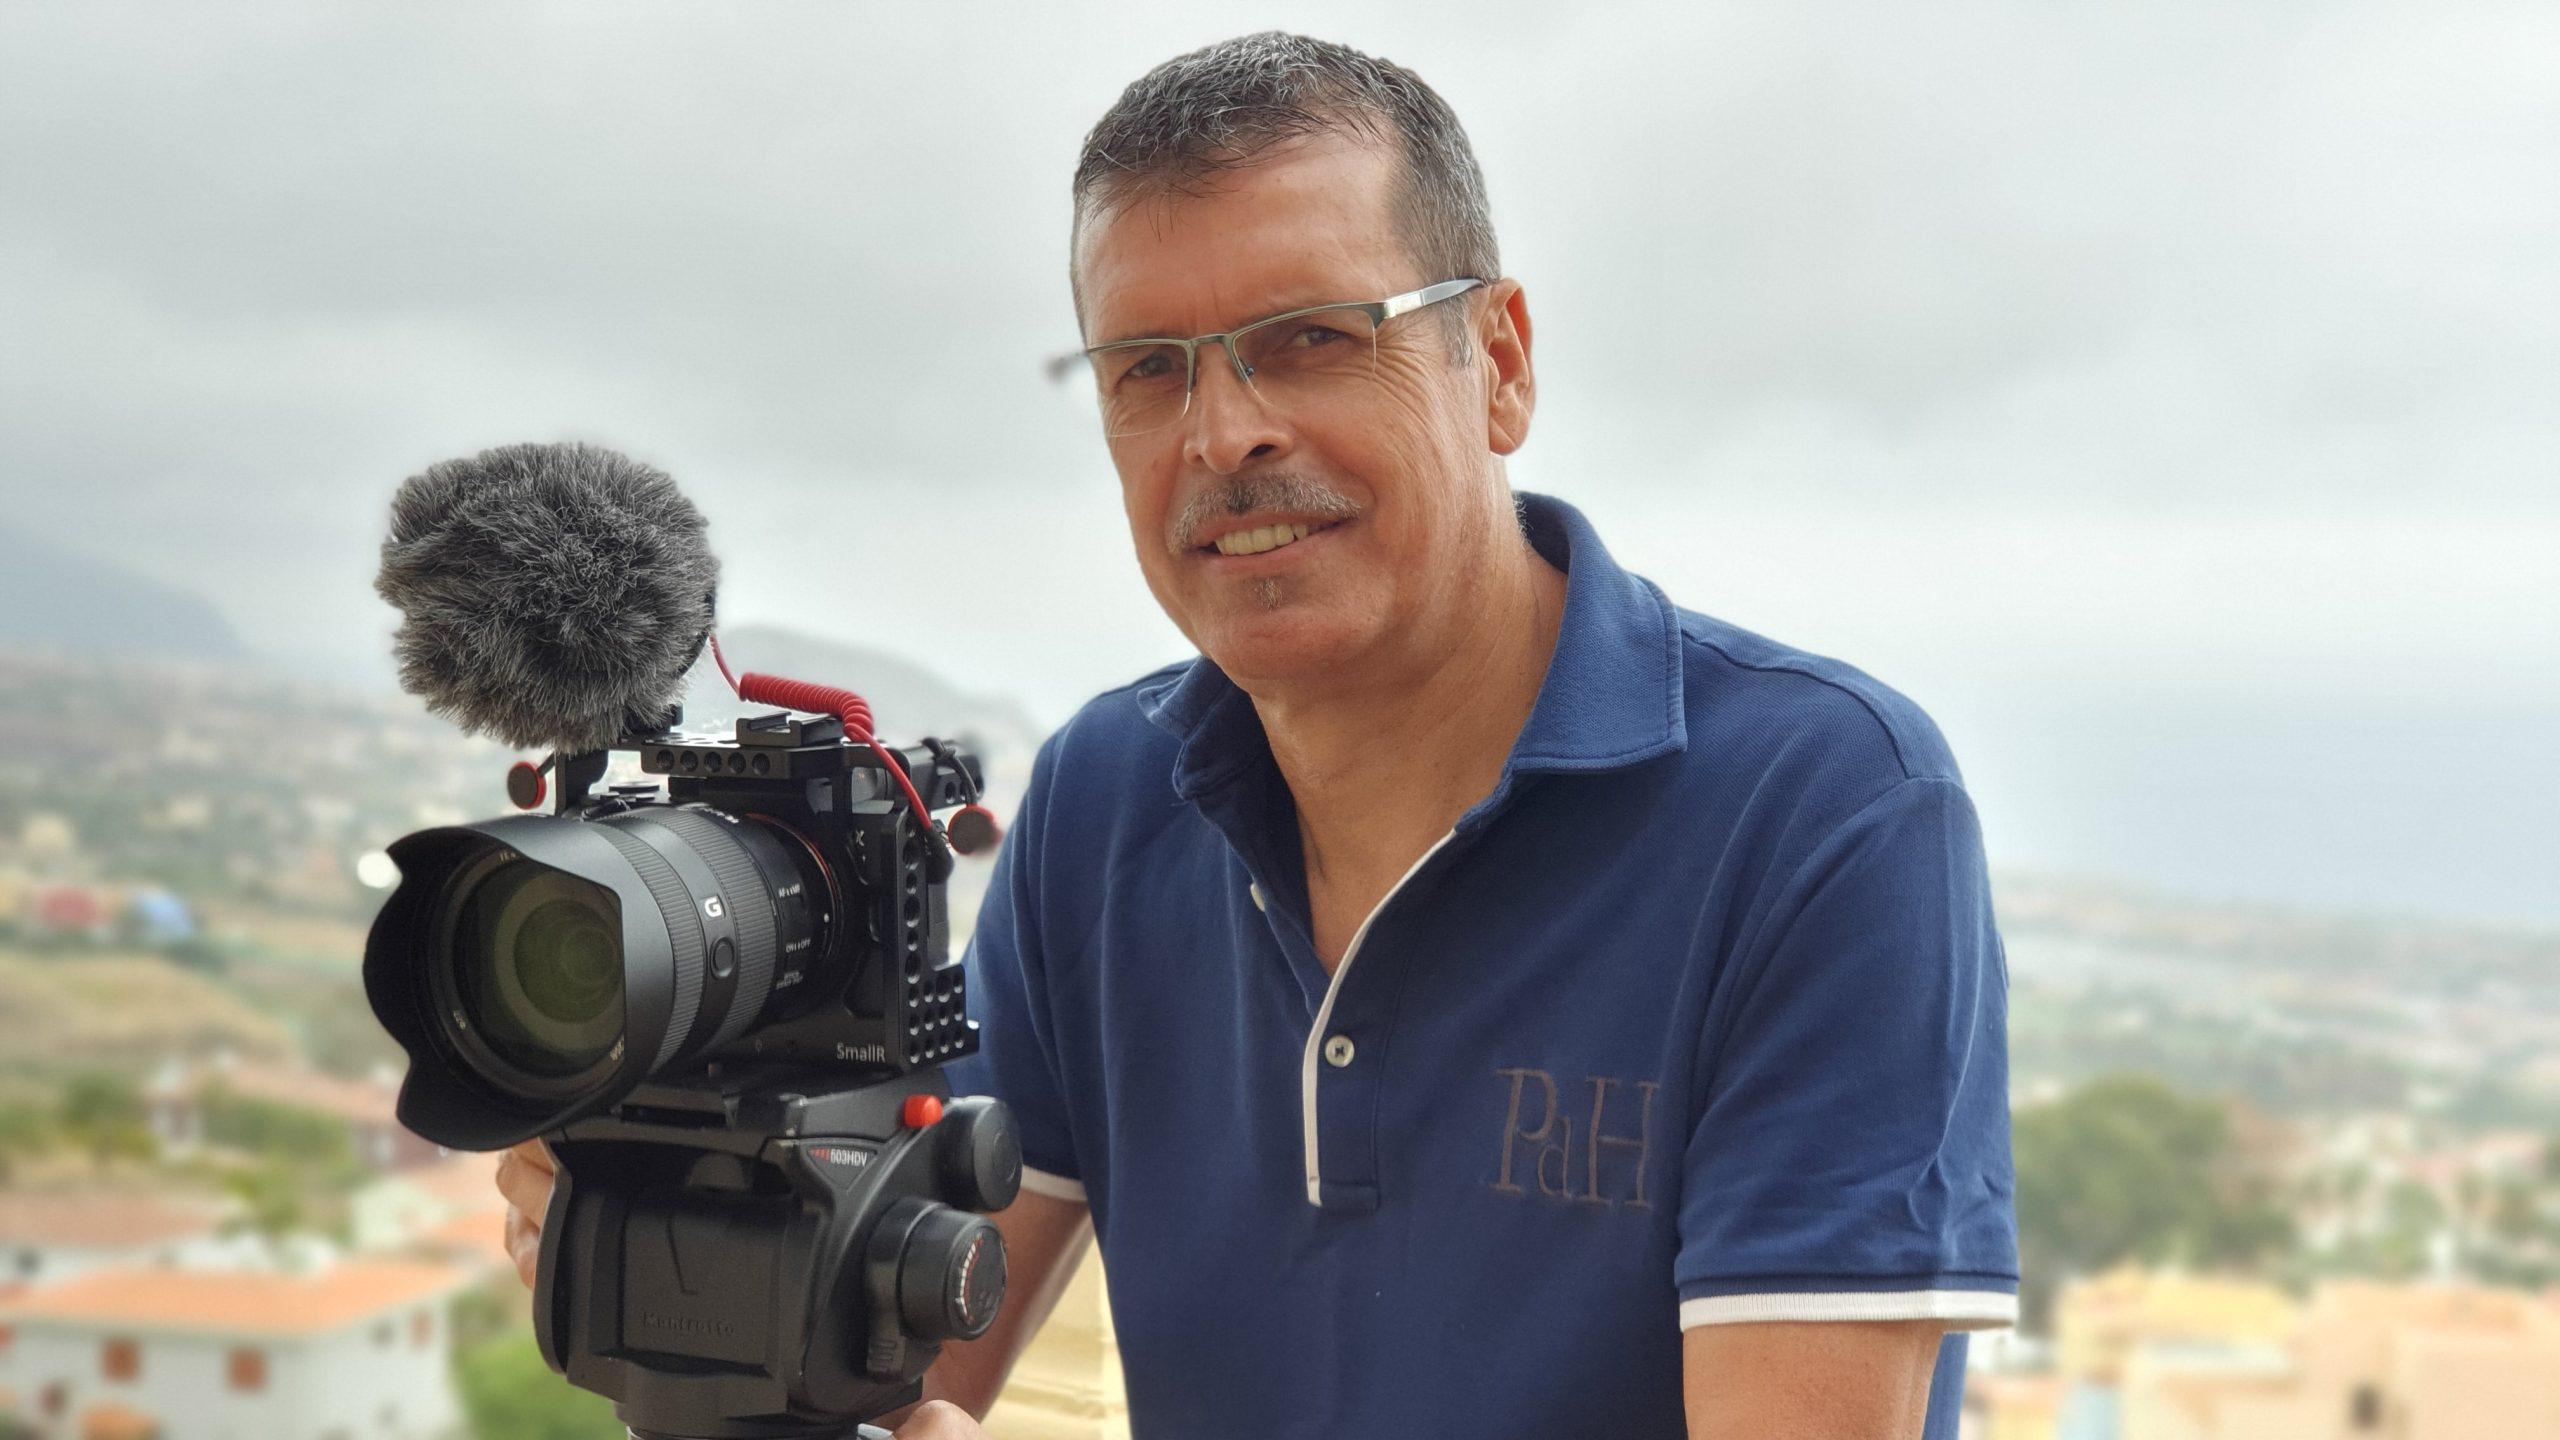 Humberto Mesa